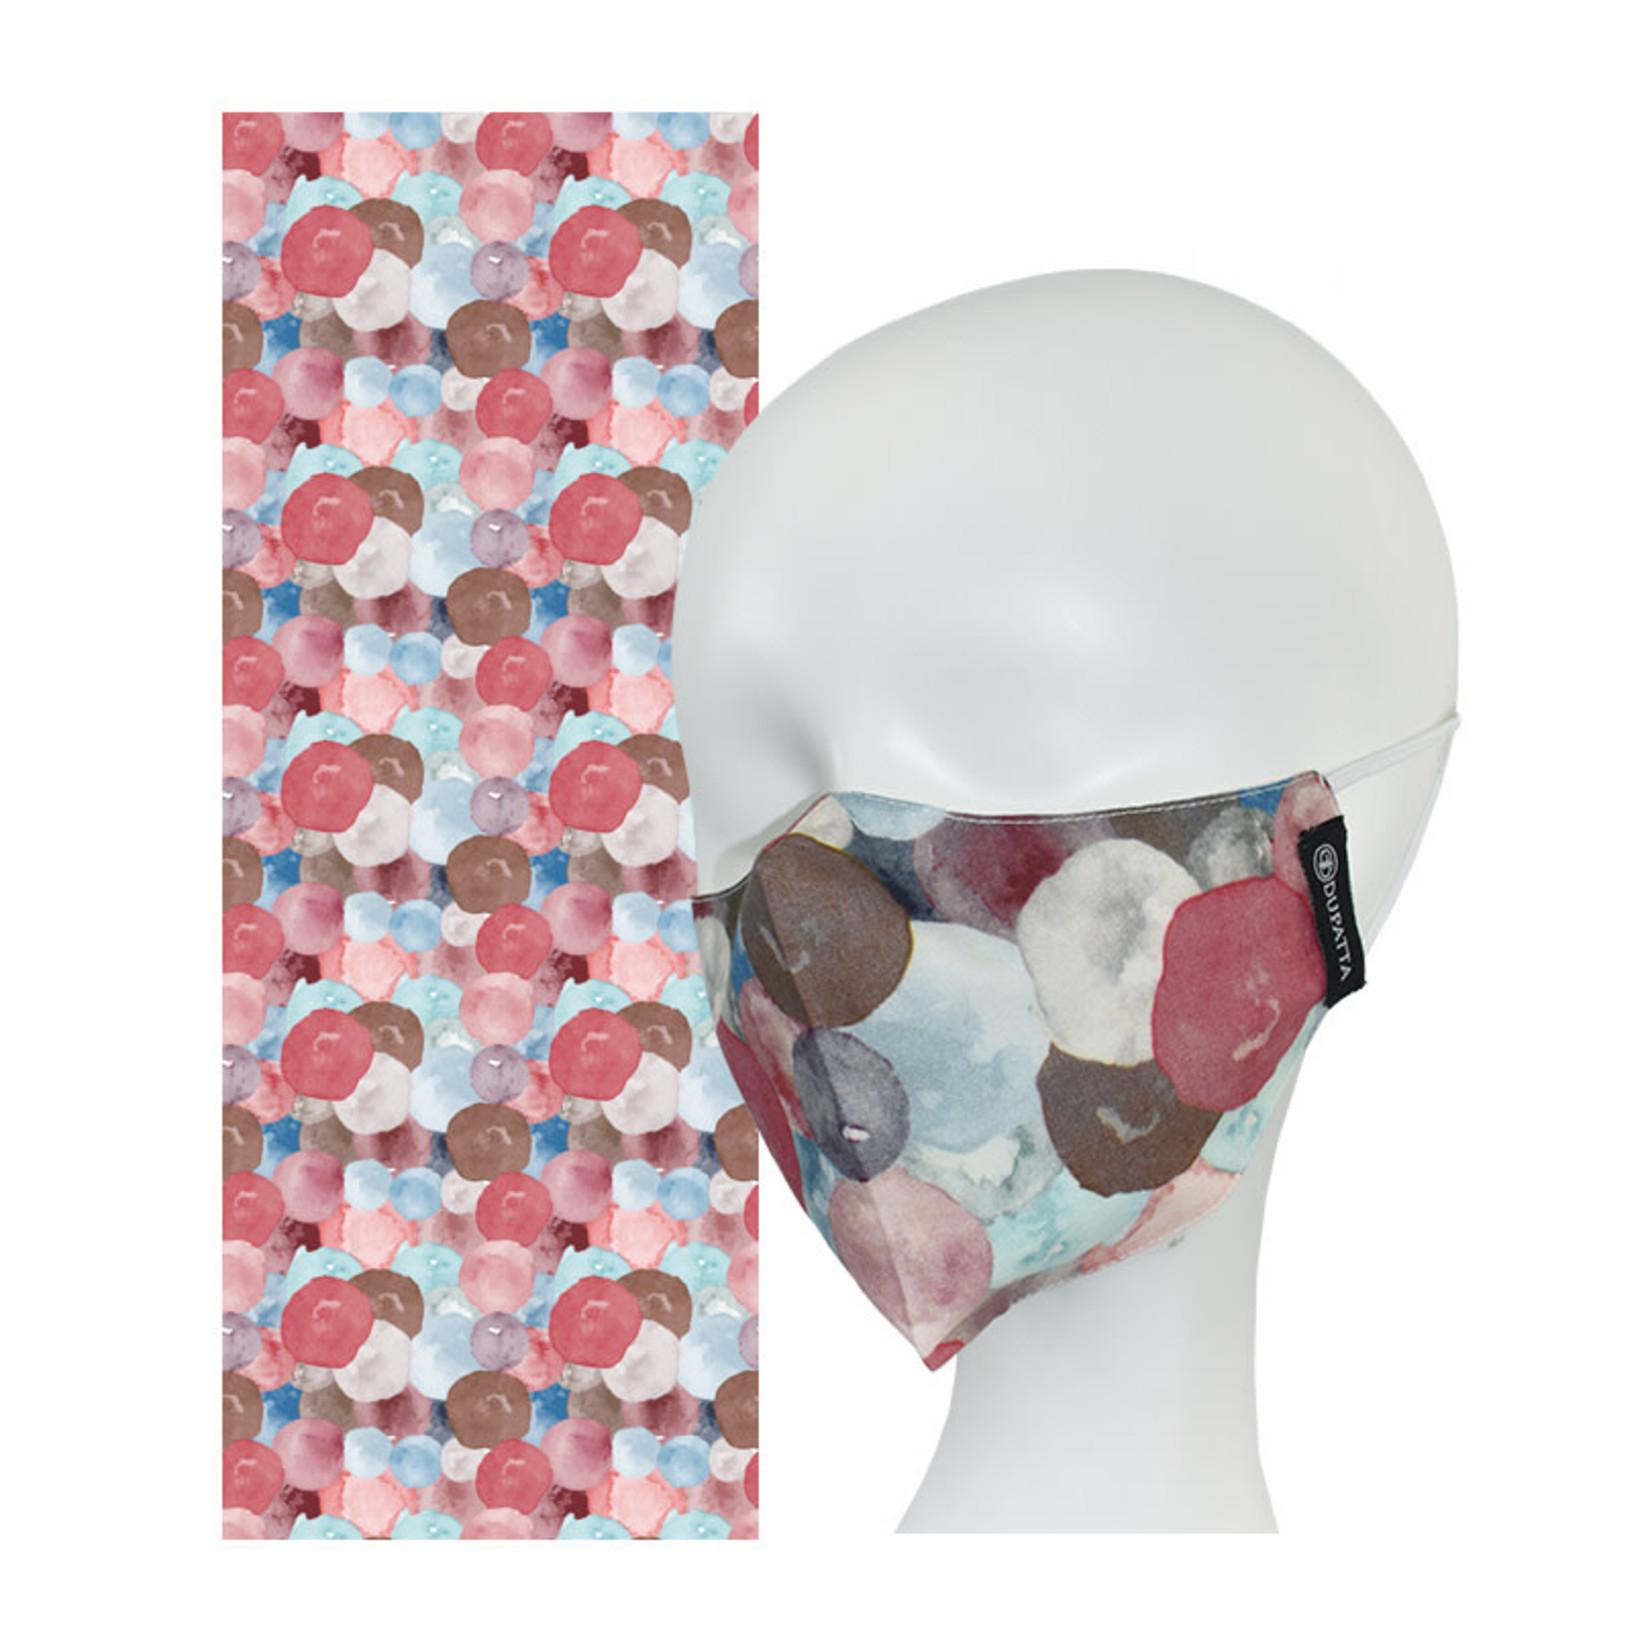 Zola Dotted Scarf & Mask Set